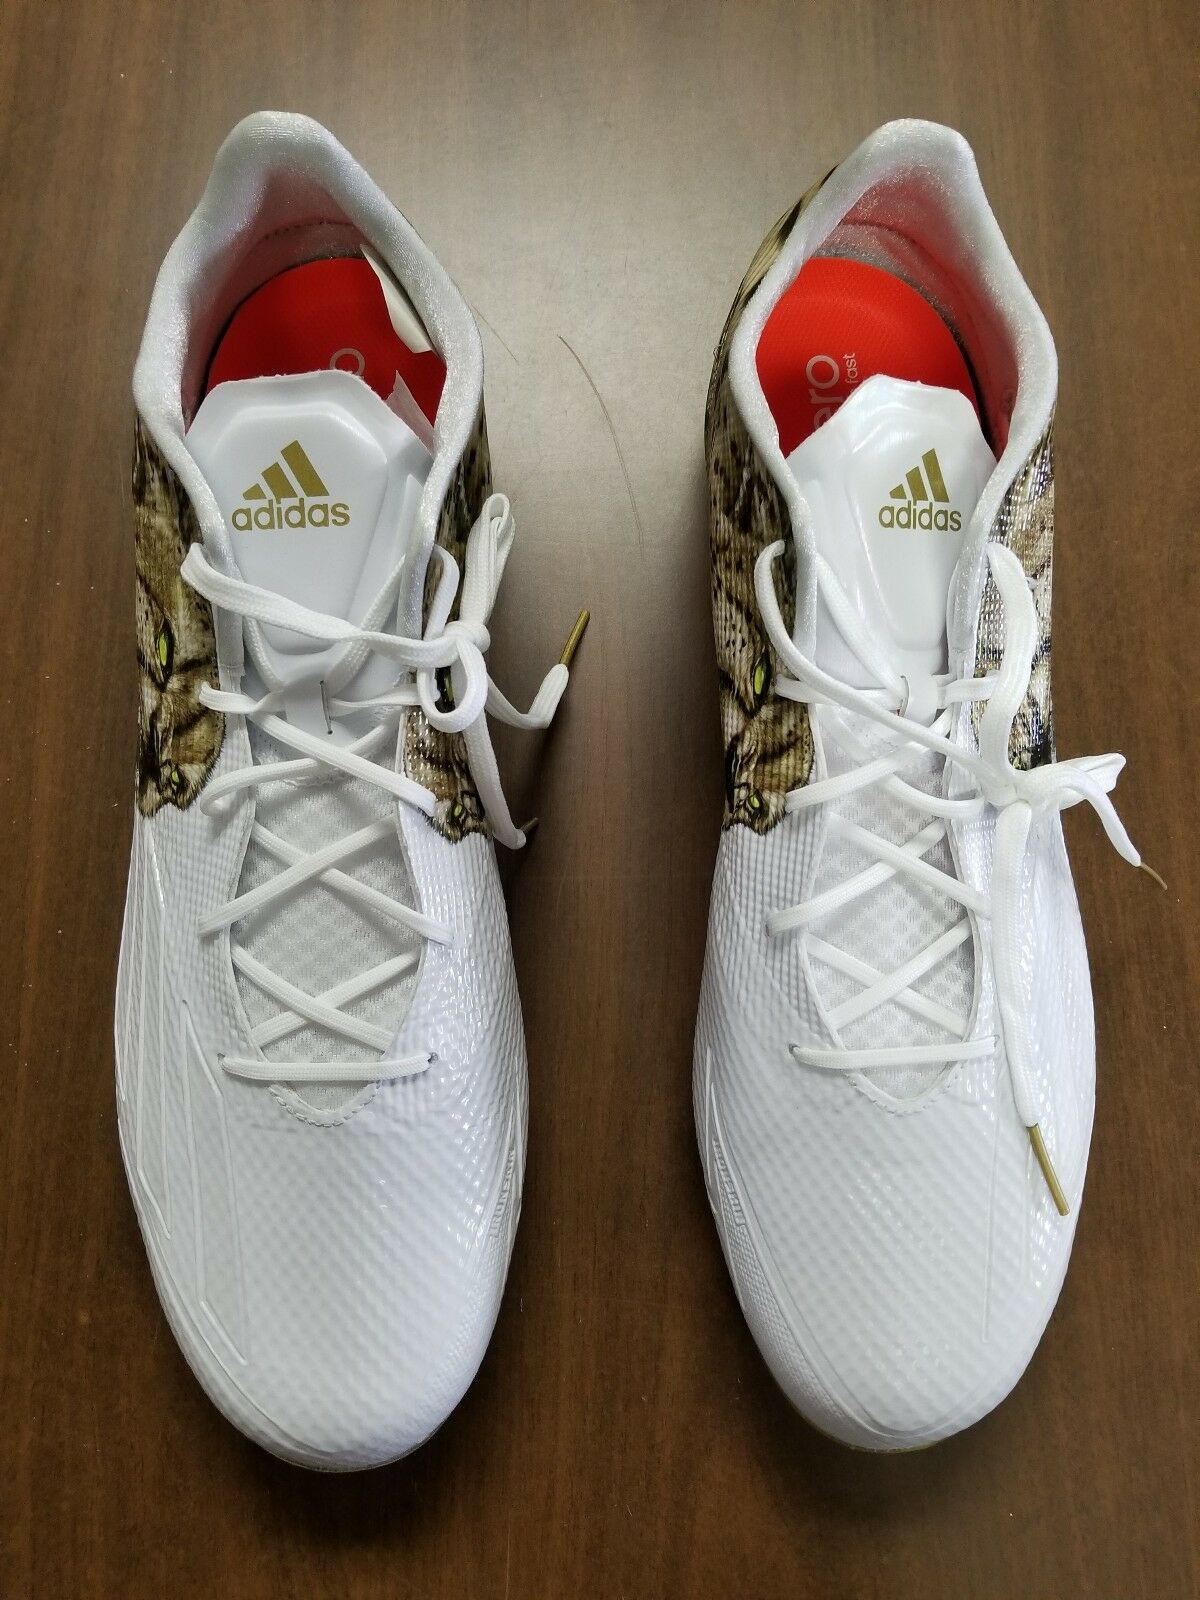 ADIDAS ADIZERO 5 STAR 5.0 CHEETAH UNCAGED FOOTBALL SHOES SIZE 16 - NEW WITH BOX